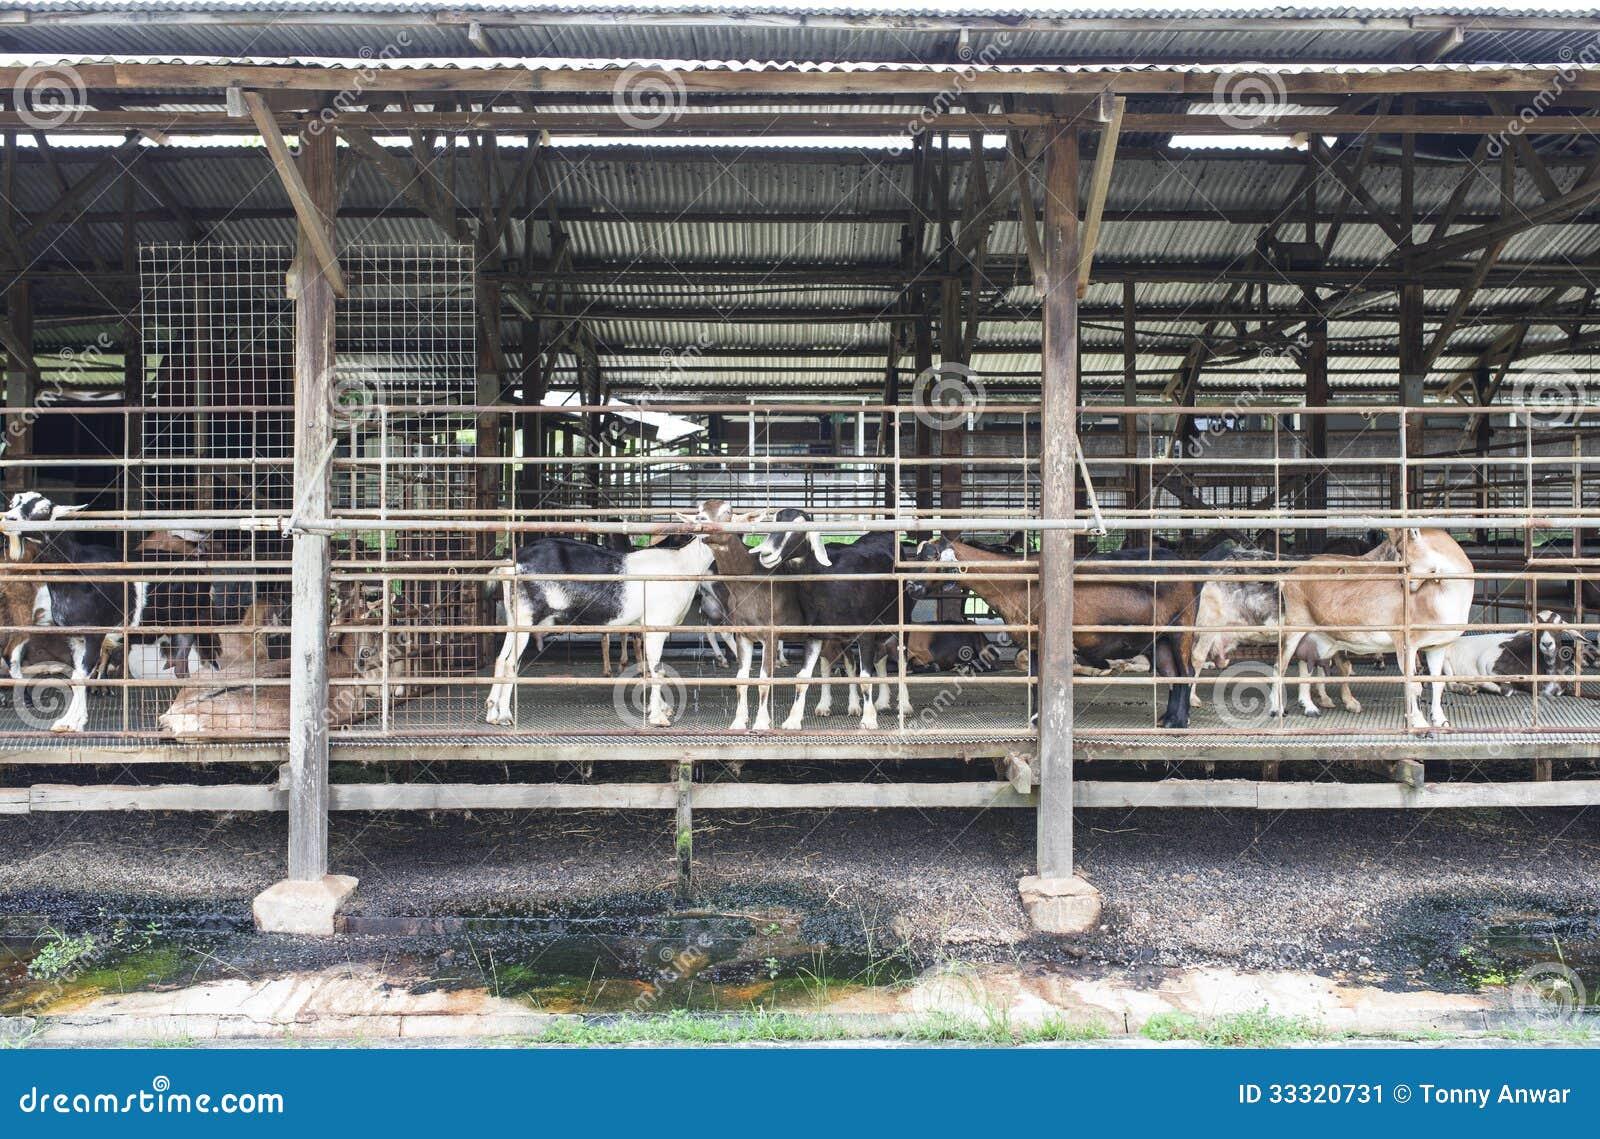 Sample dairy farm business plan